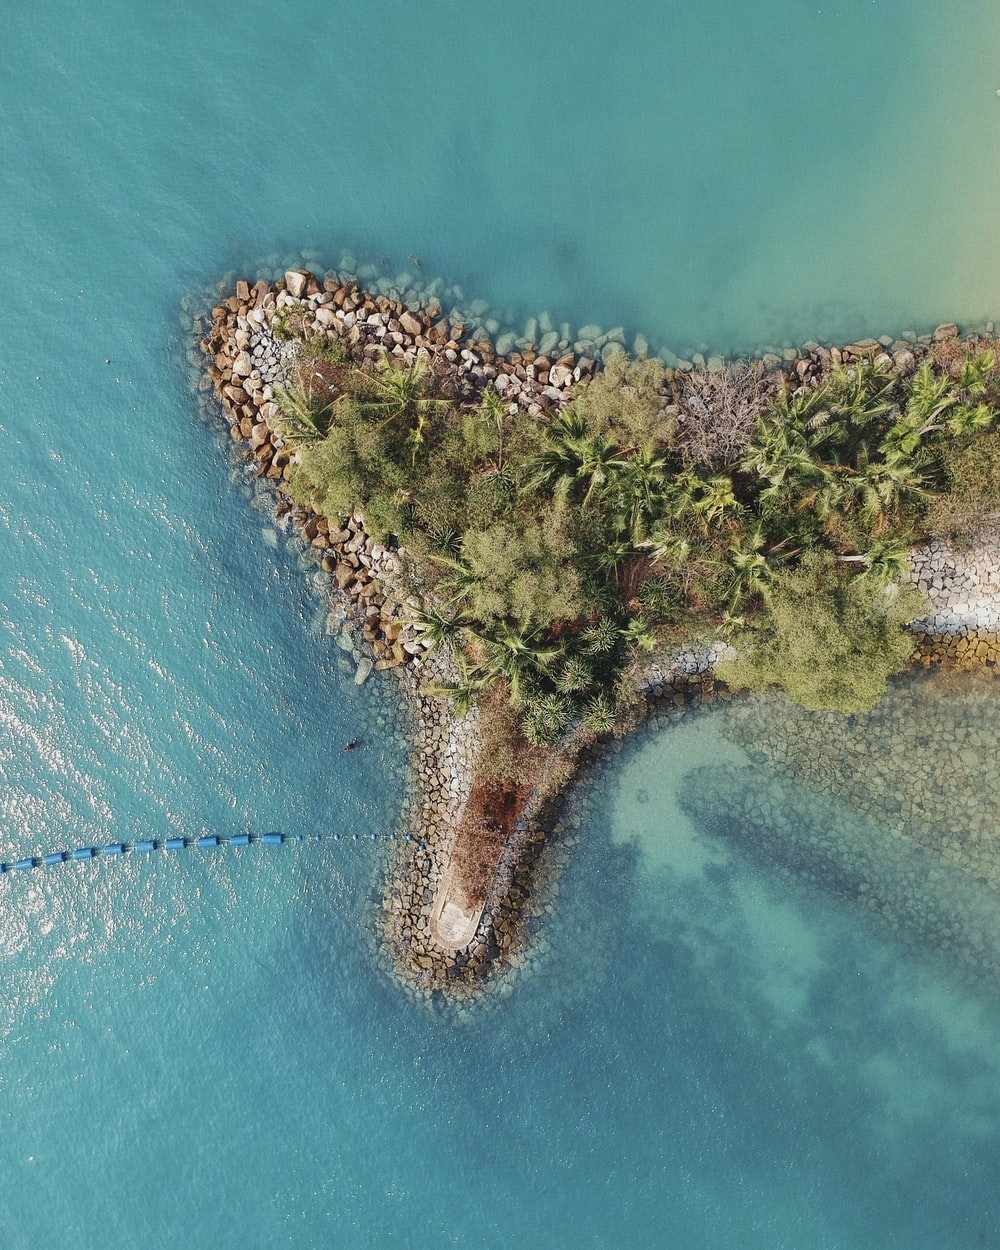 birds-eye view photography of island